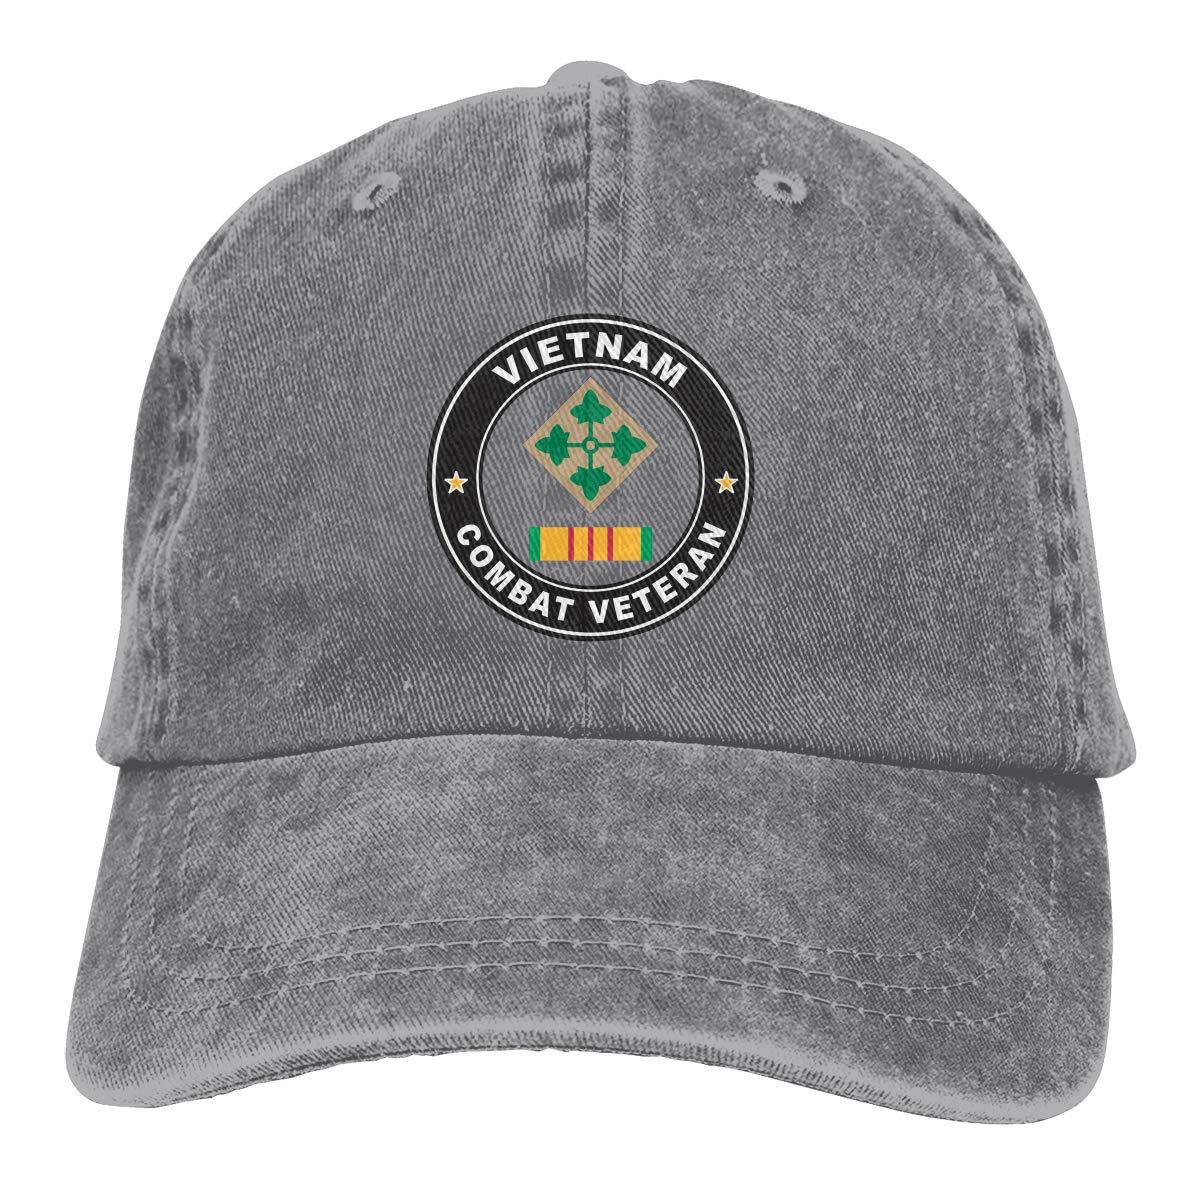 4th Infantry Division Vietnam Combat Veteran Fashion Adjustable Cowboy Cap Denim Hat for Women and Men